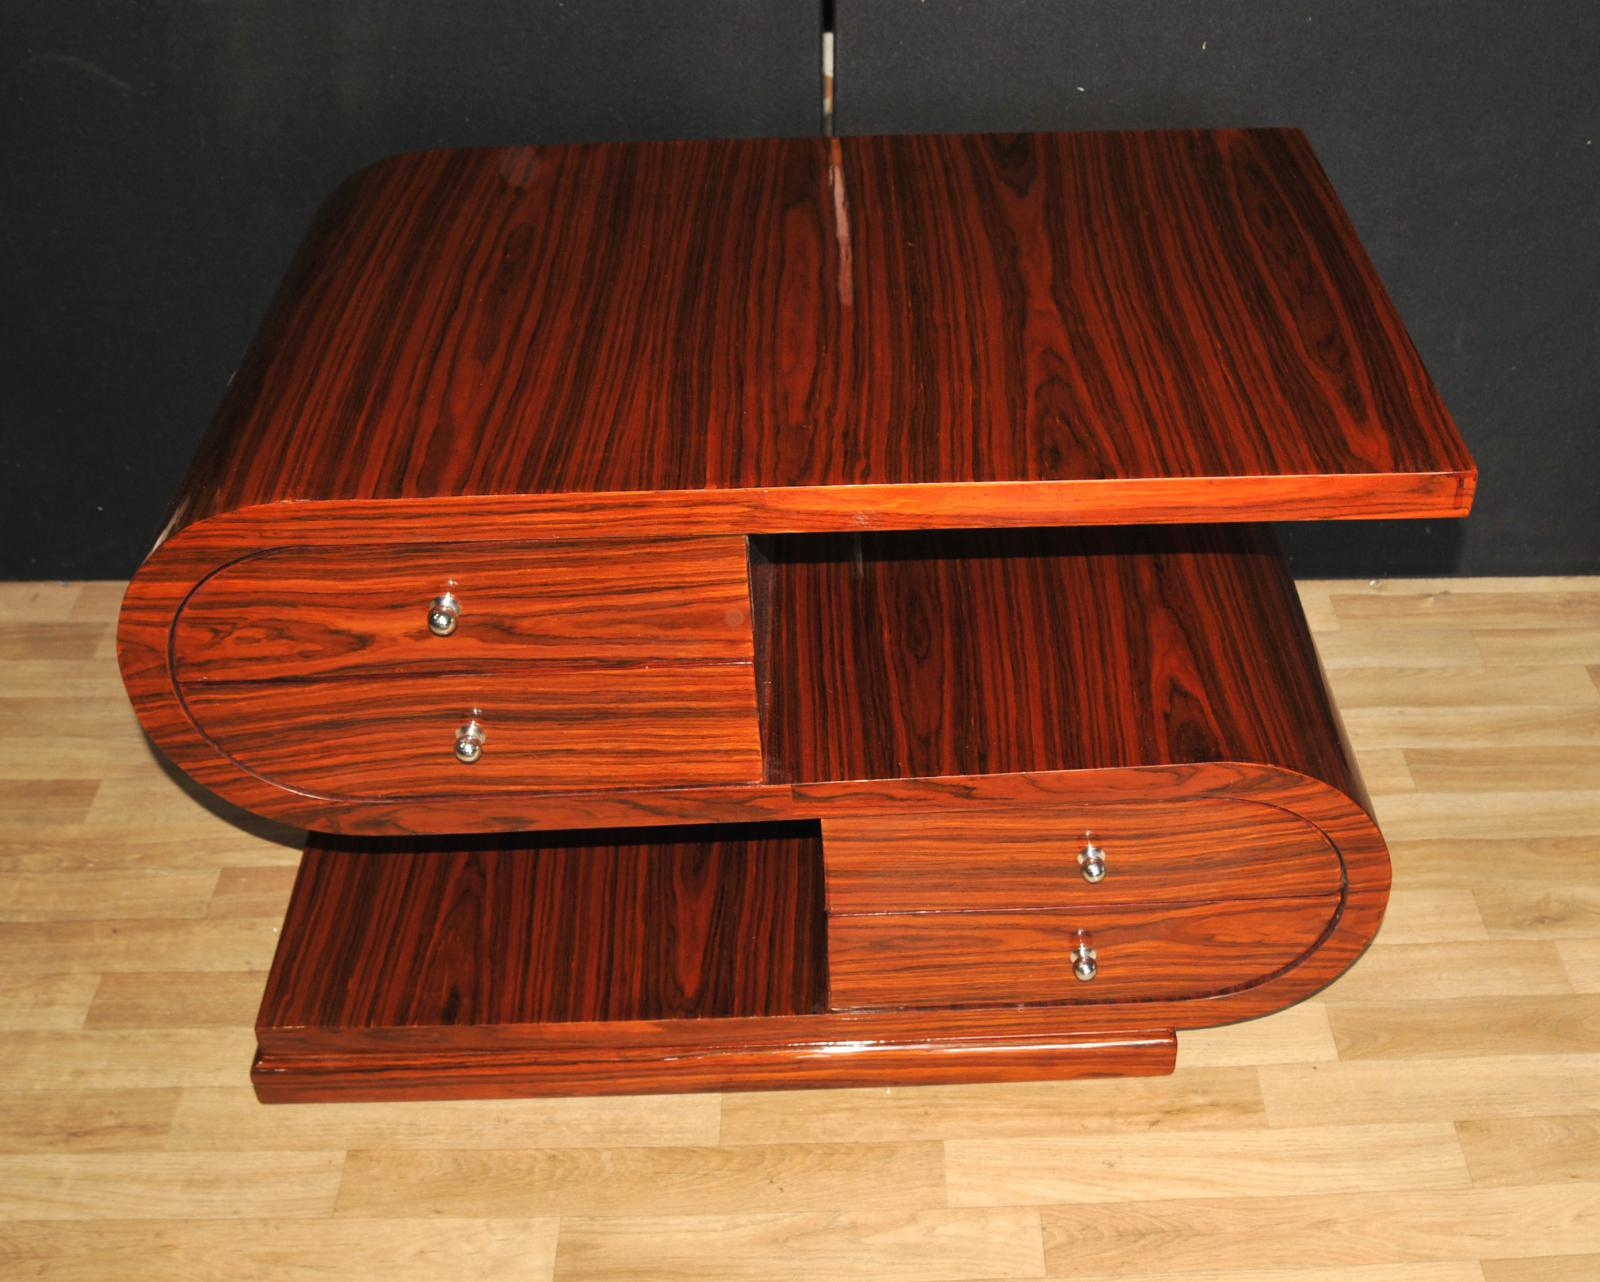 Art deco s shape coffee table rosewood modernist furniture - Table basse art deco ...